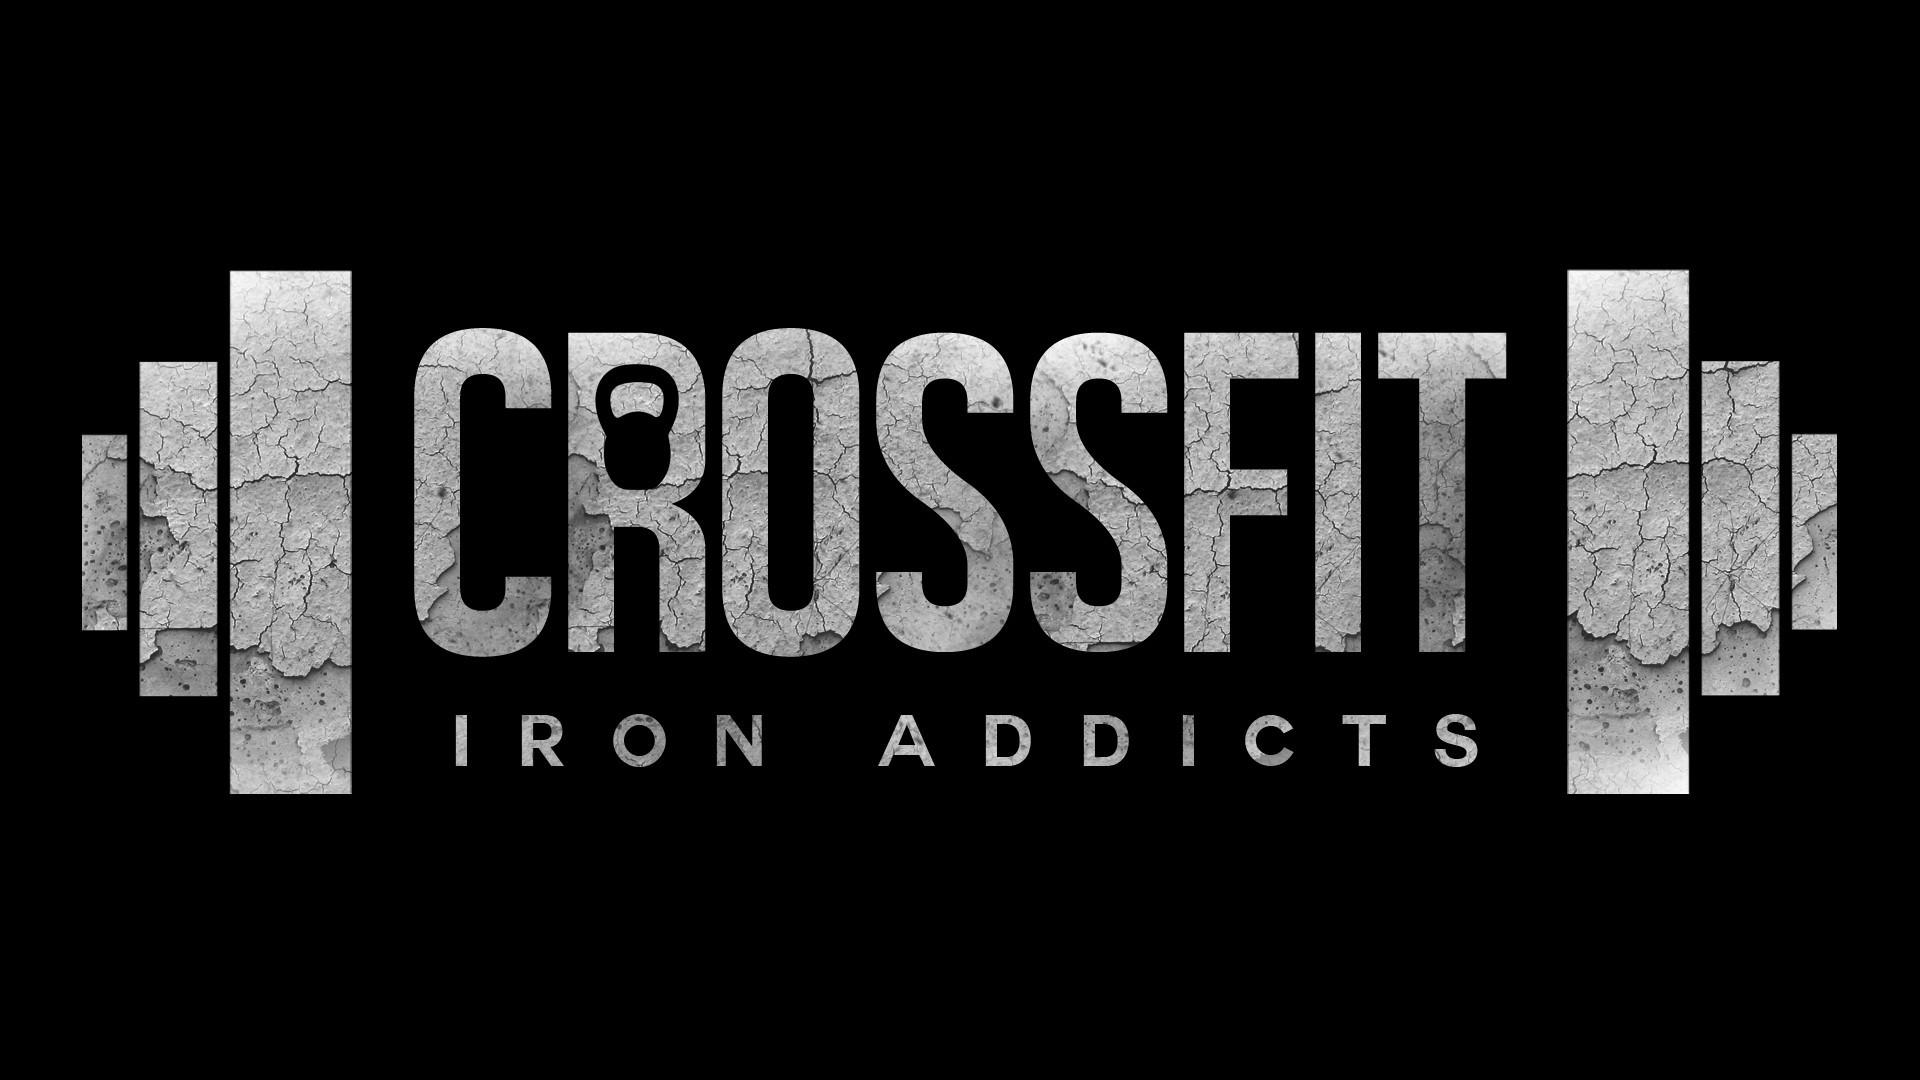 Download 1920x1080 crossfit ...